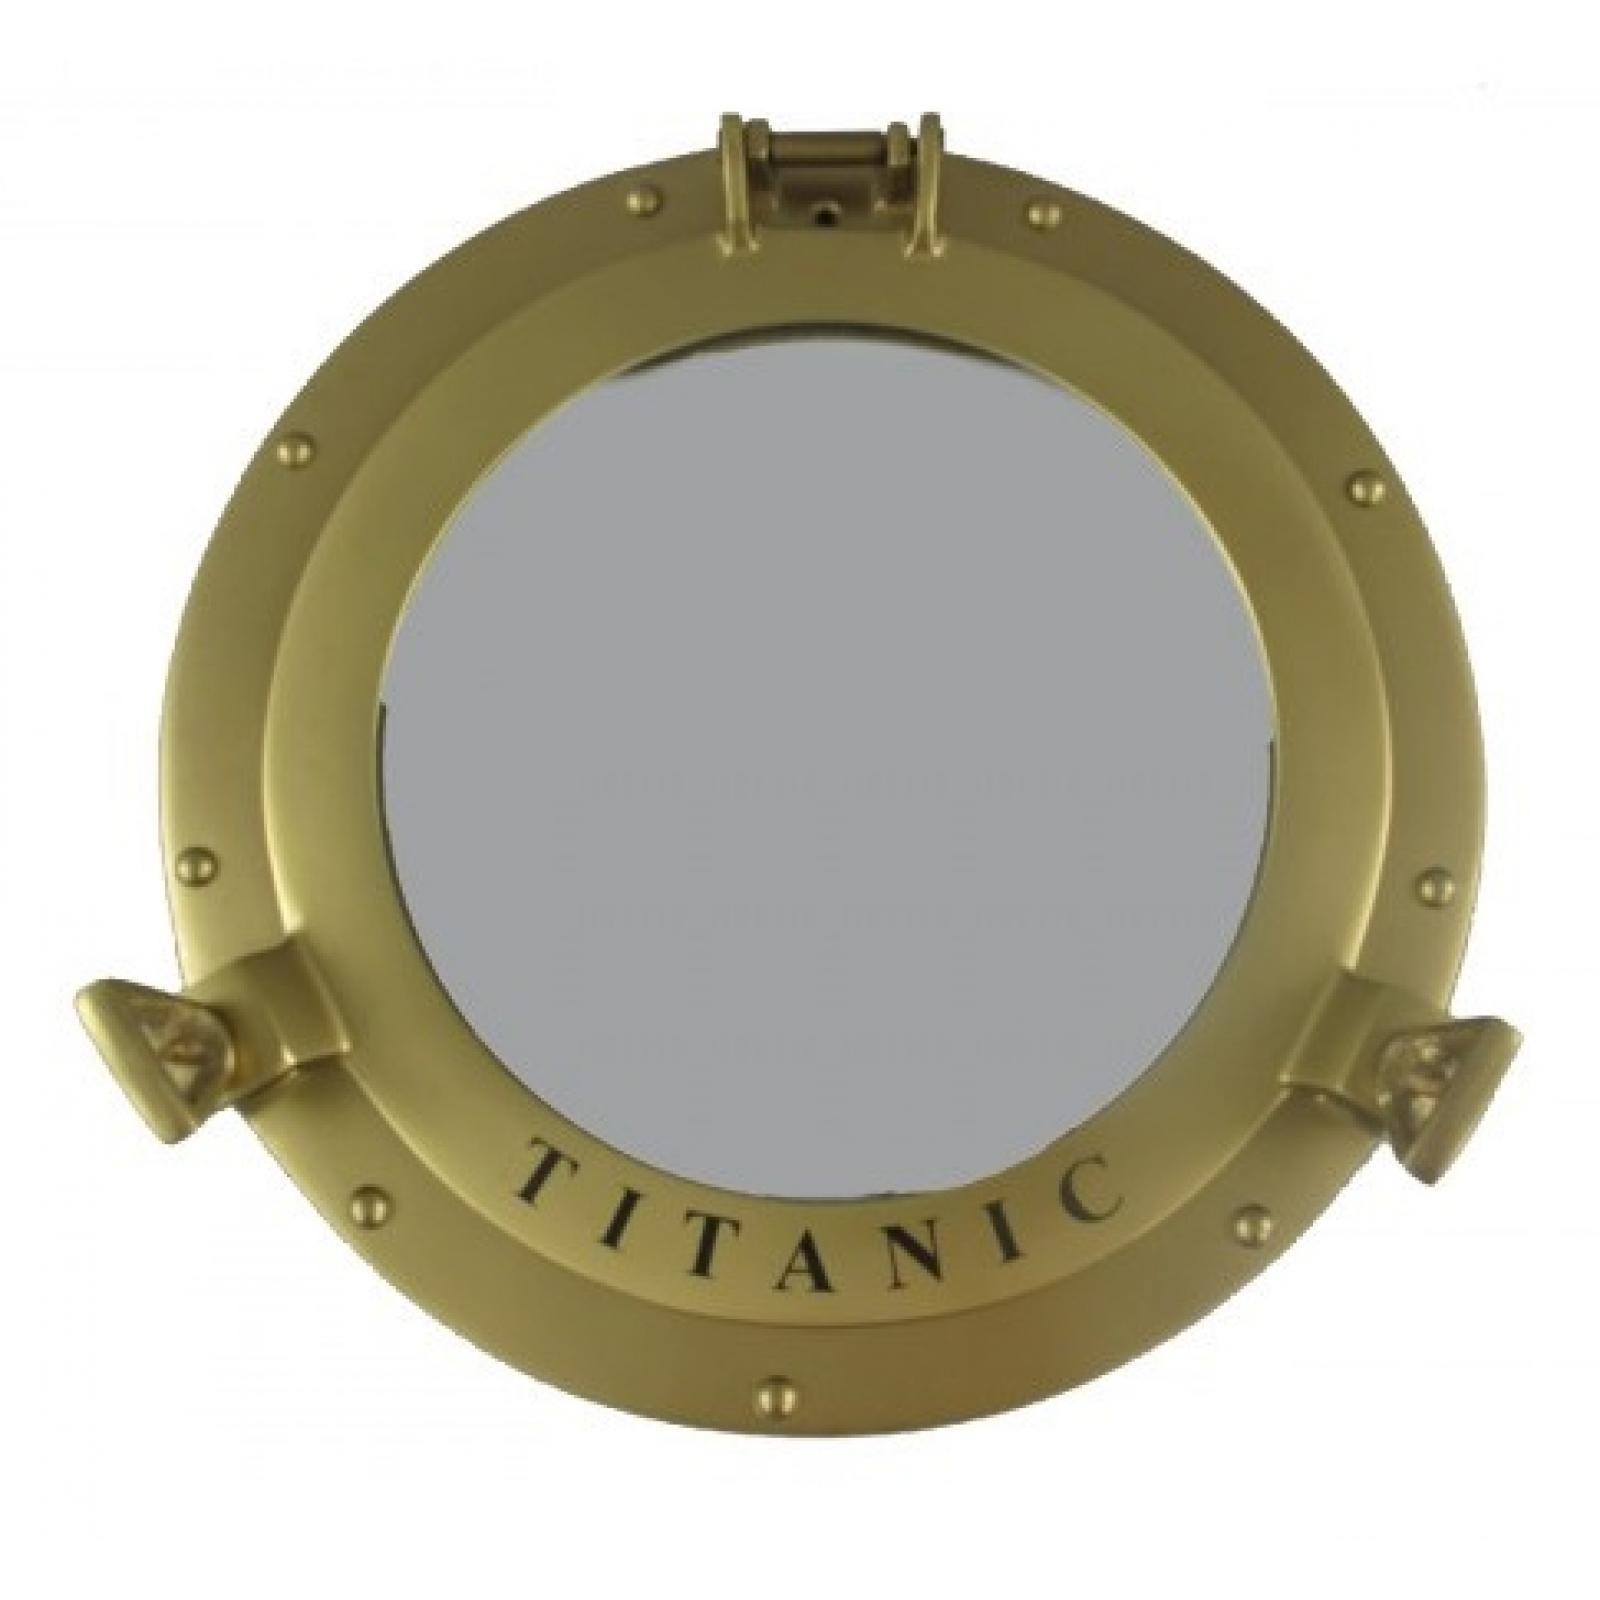 hublot titanic salle de bain mur miroir maritime aluminium 29cm or bateau d co ebay. Black Bedroom Furniture Sets. Home Design Ideas